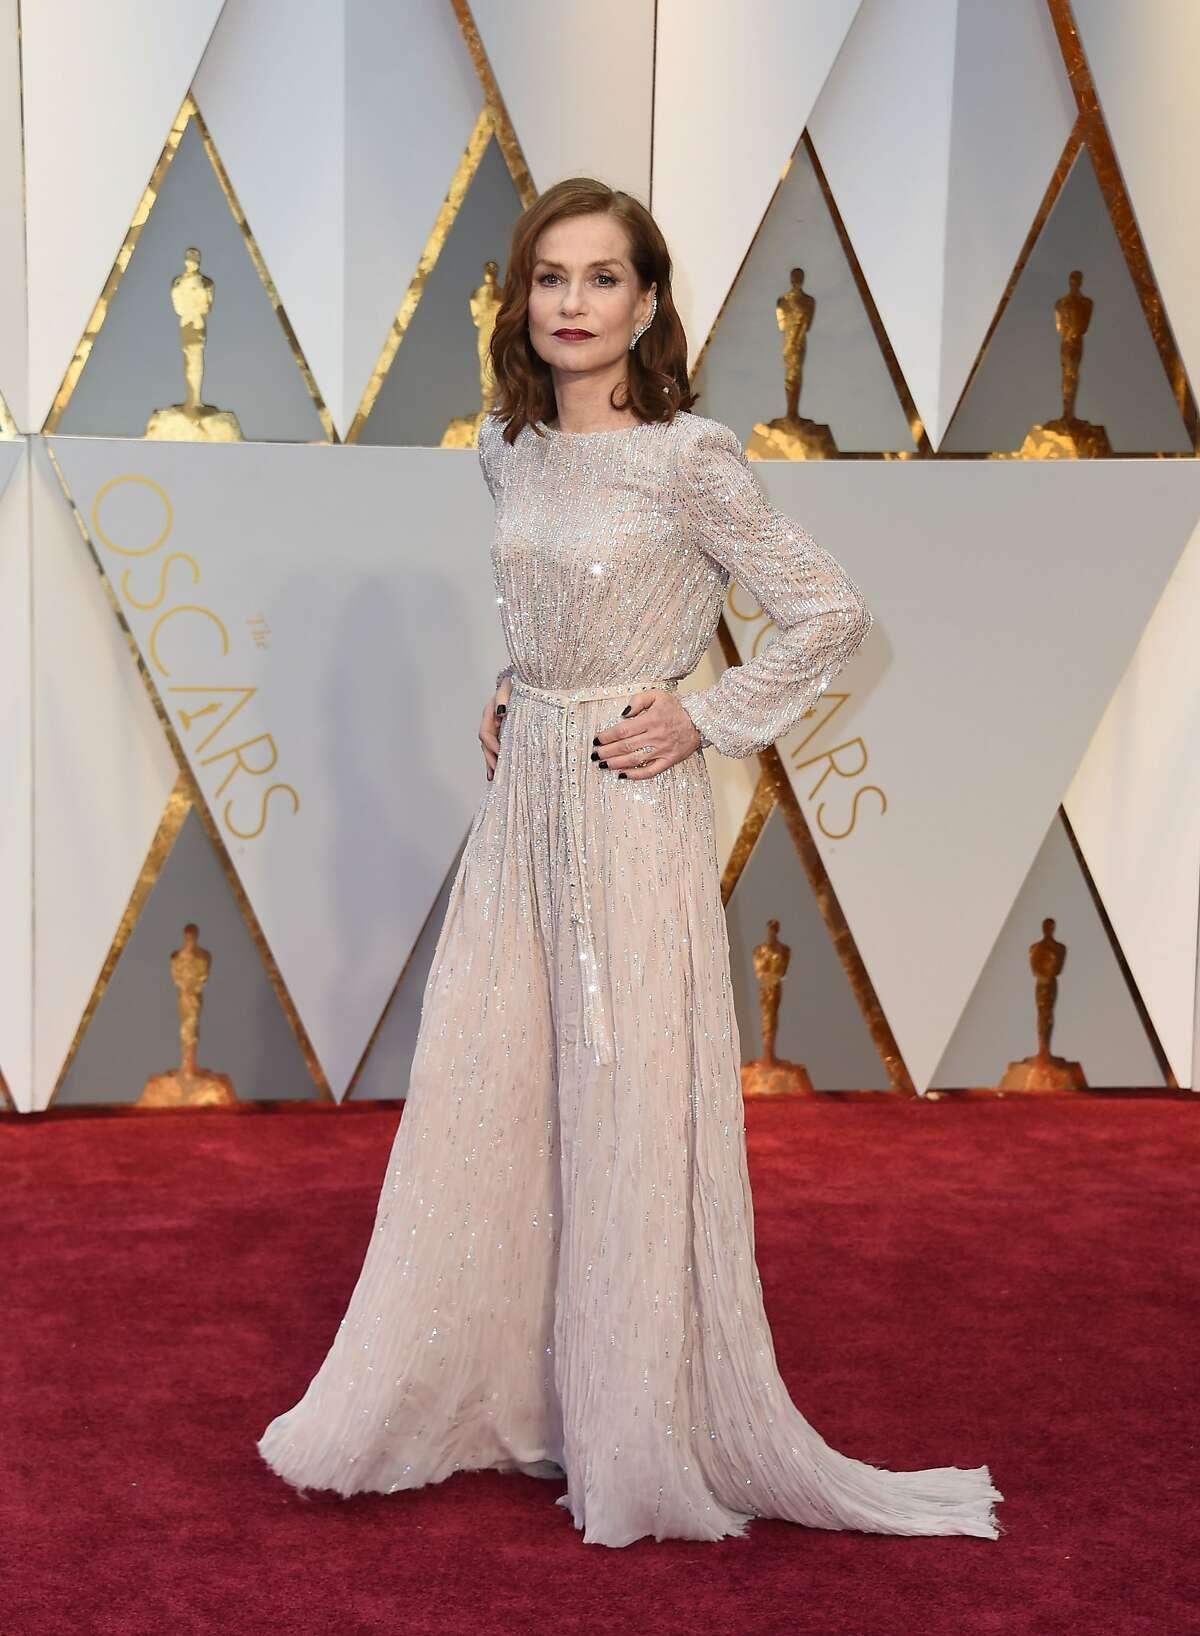 Nominee for Best Actress